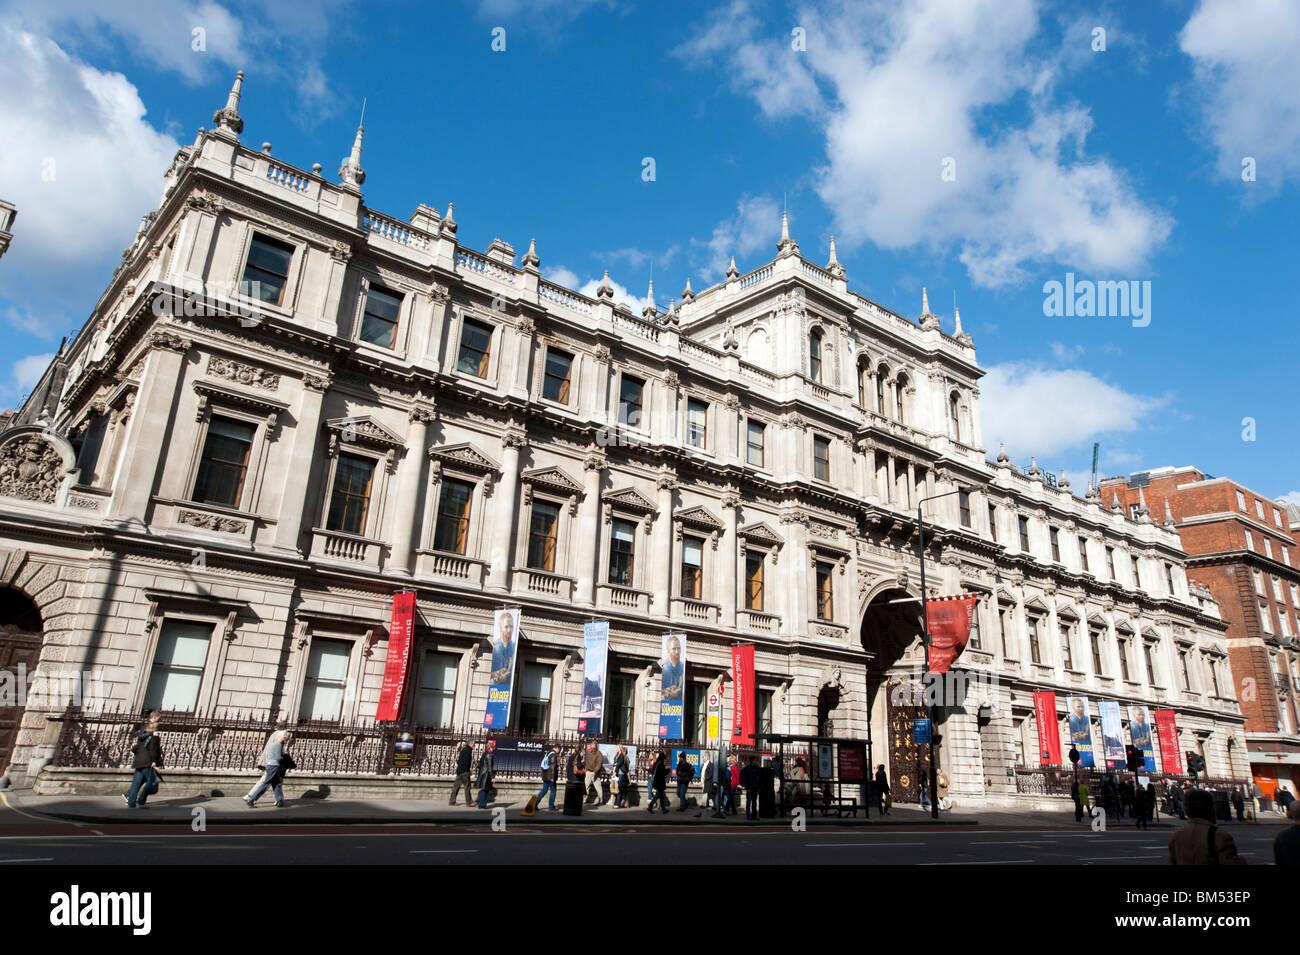 Royal Academy of Arts, Piccadilly, London, England, Vereinigtes Königreich Stockbild